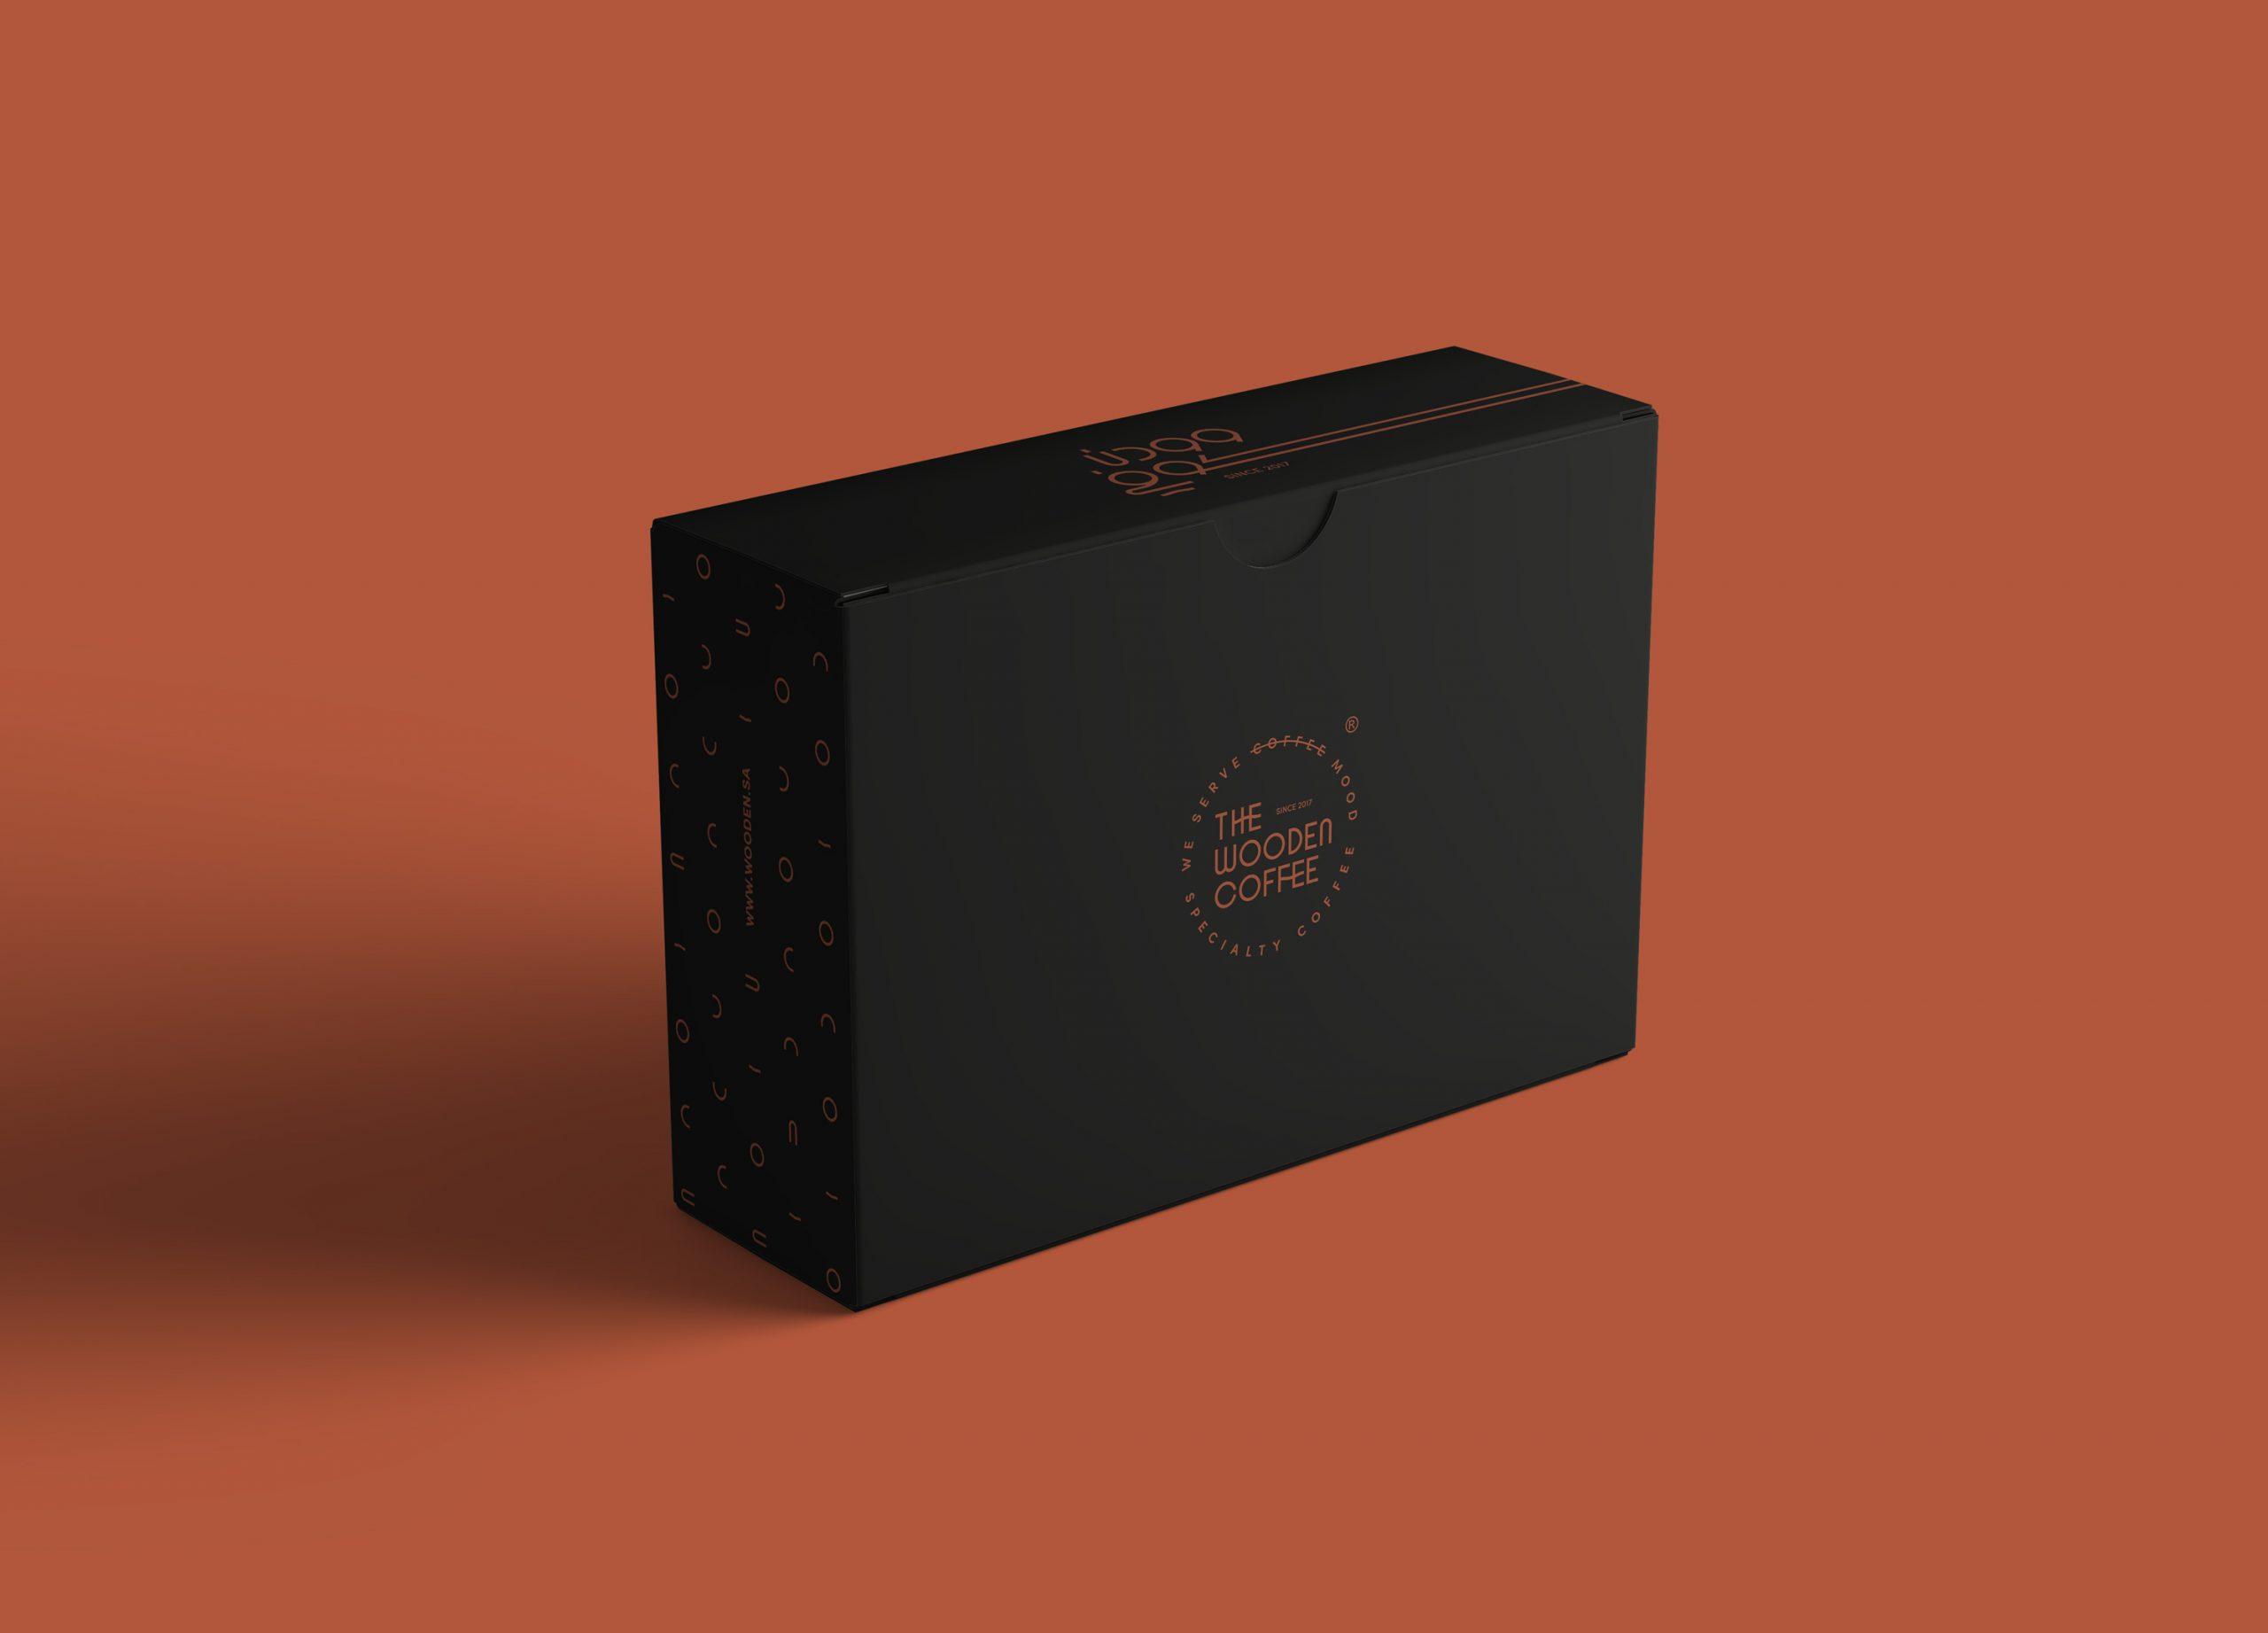 RectangleBox-Wooden-Coffee-Work-by-YaStudio